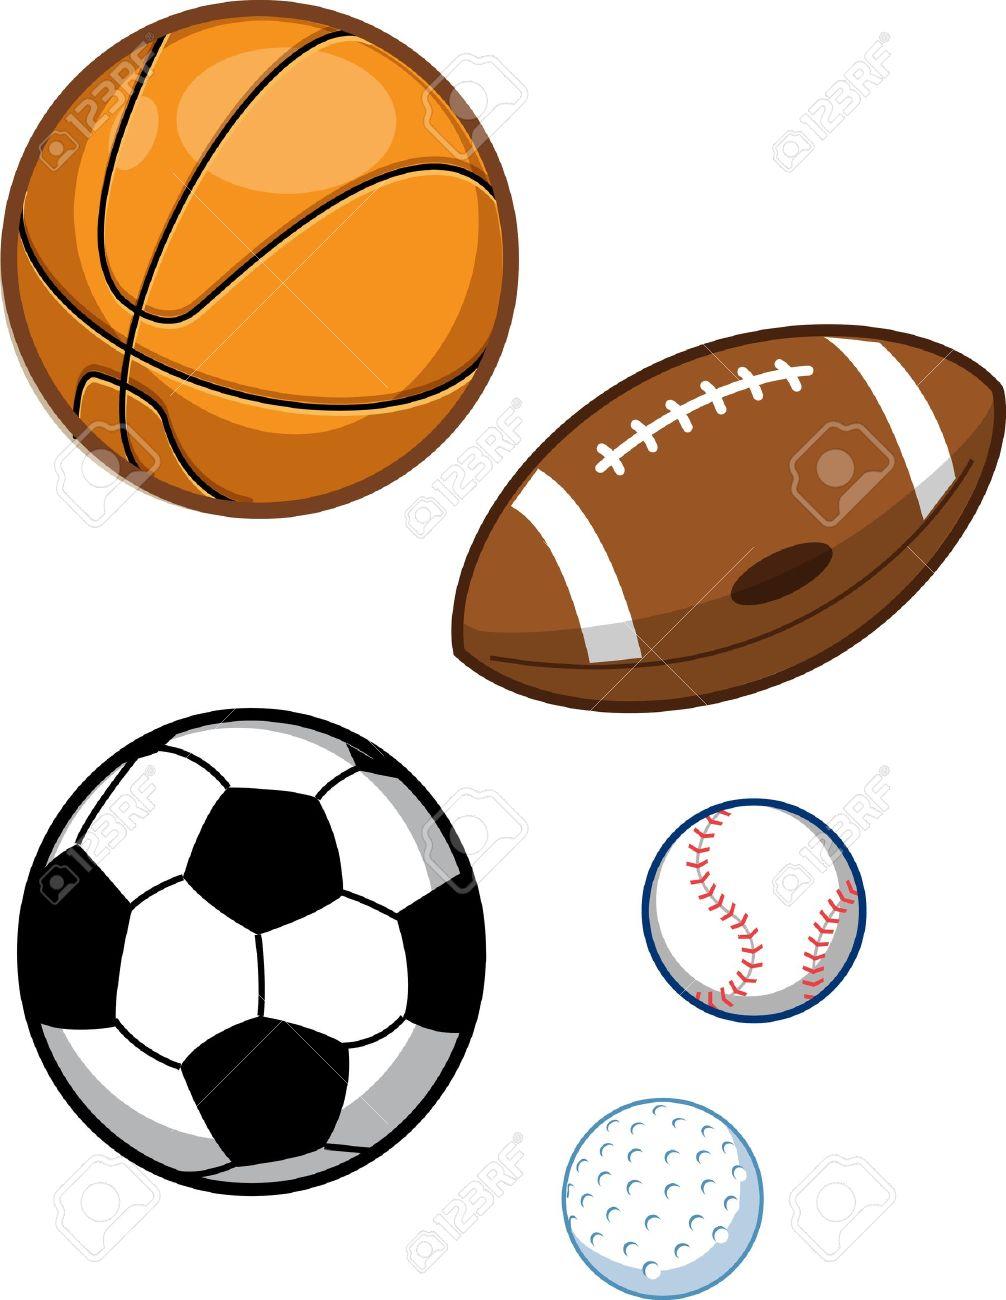 Assorted Sports Balls; Basketball, Football, Soccer Ball, Baseball,...